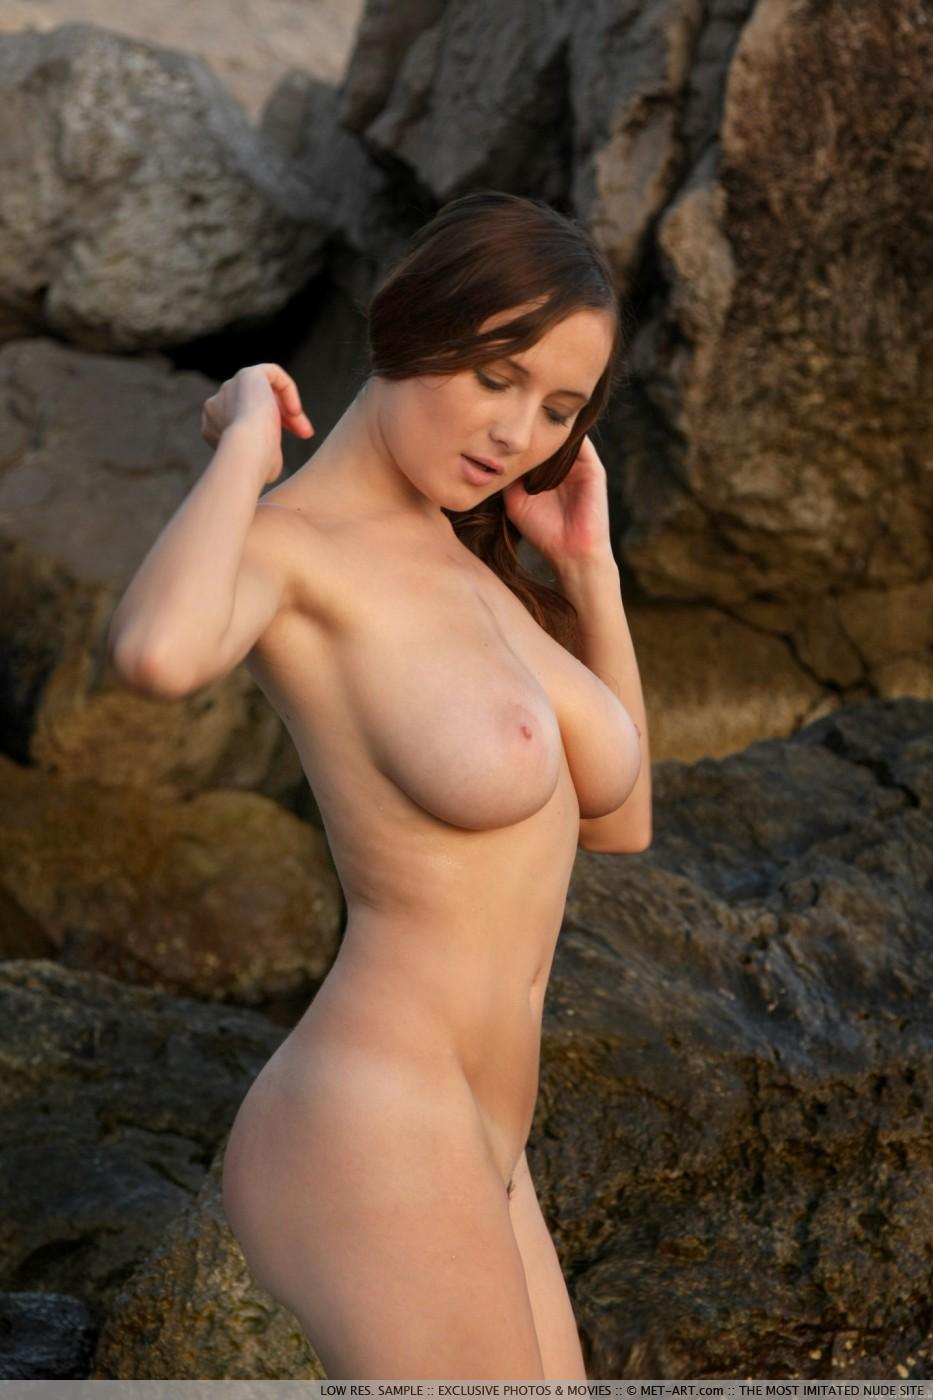 Nude women for art-4891